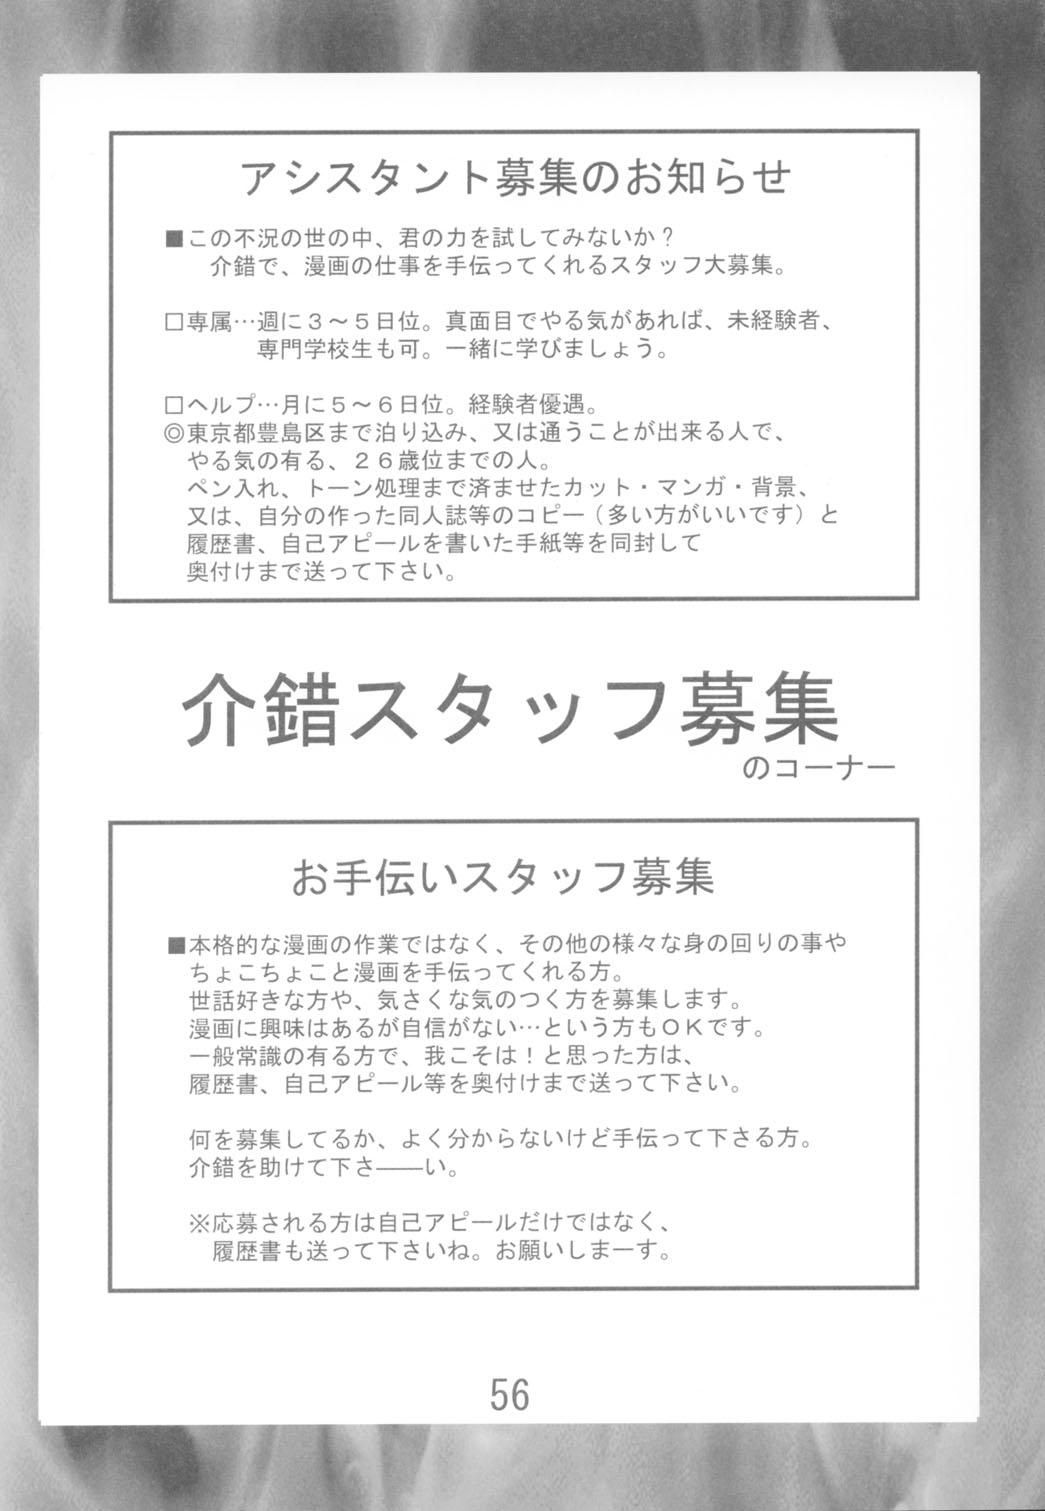 KAISHAKU RAGUNAROK ONLINE 55